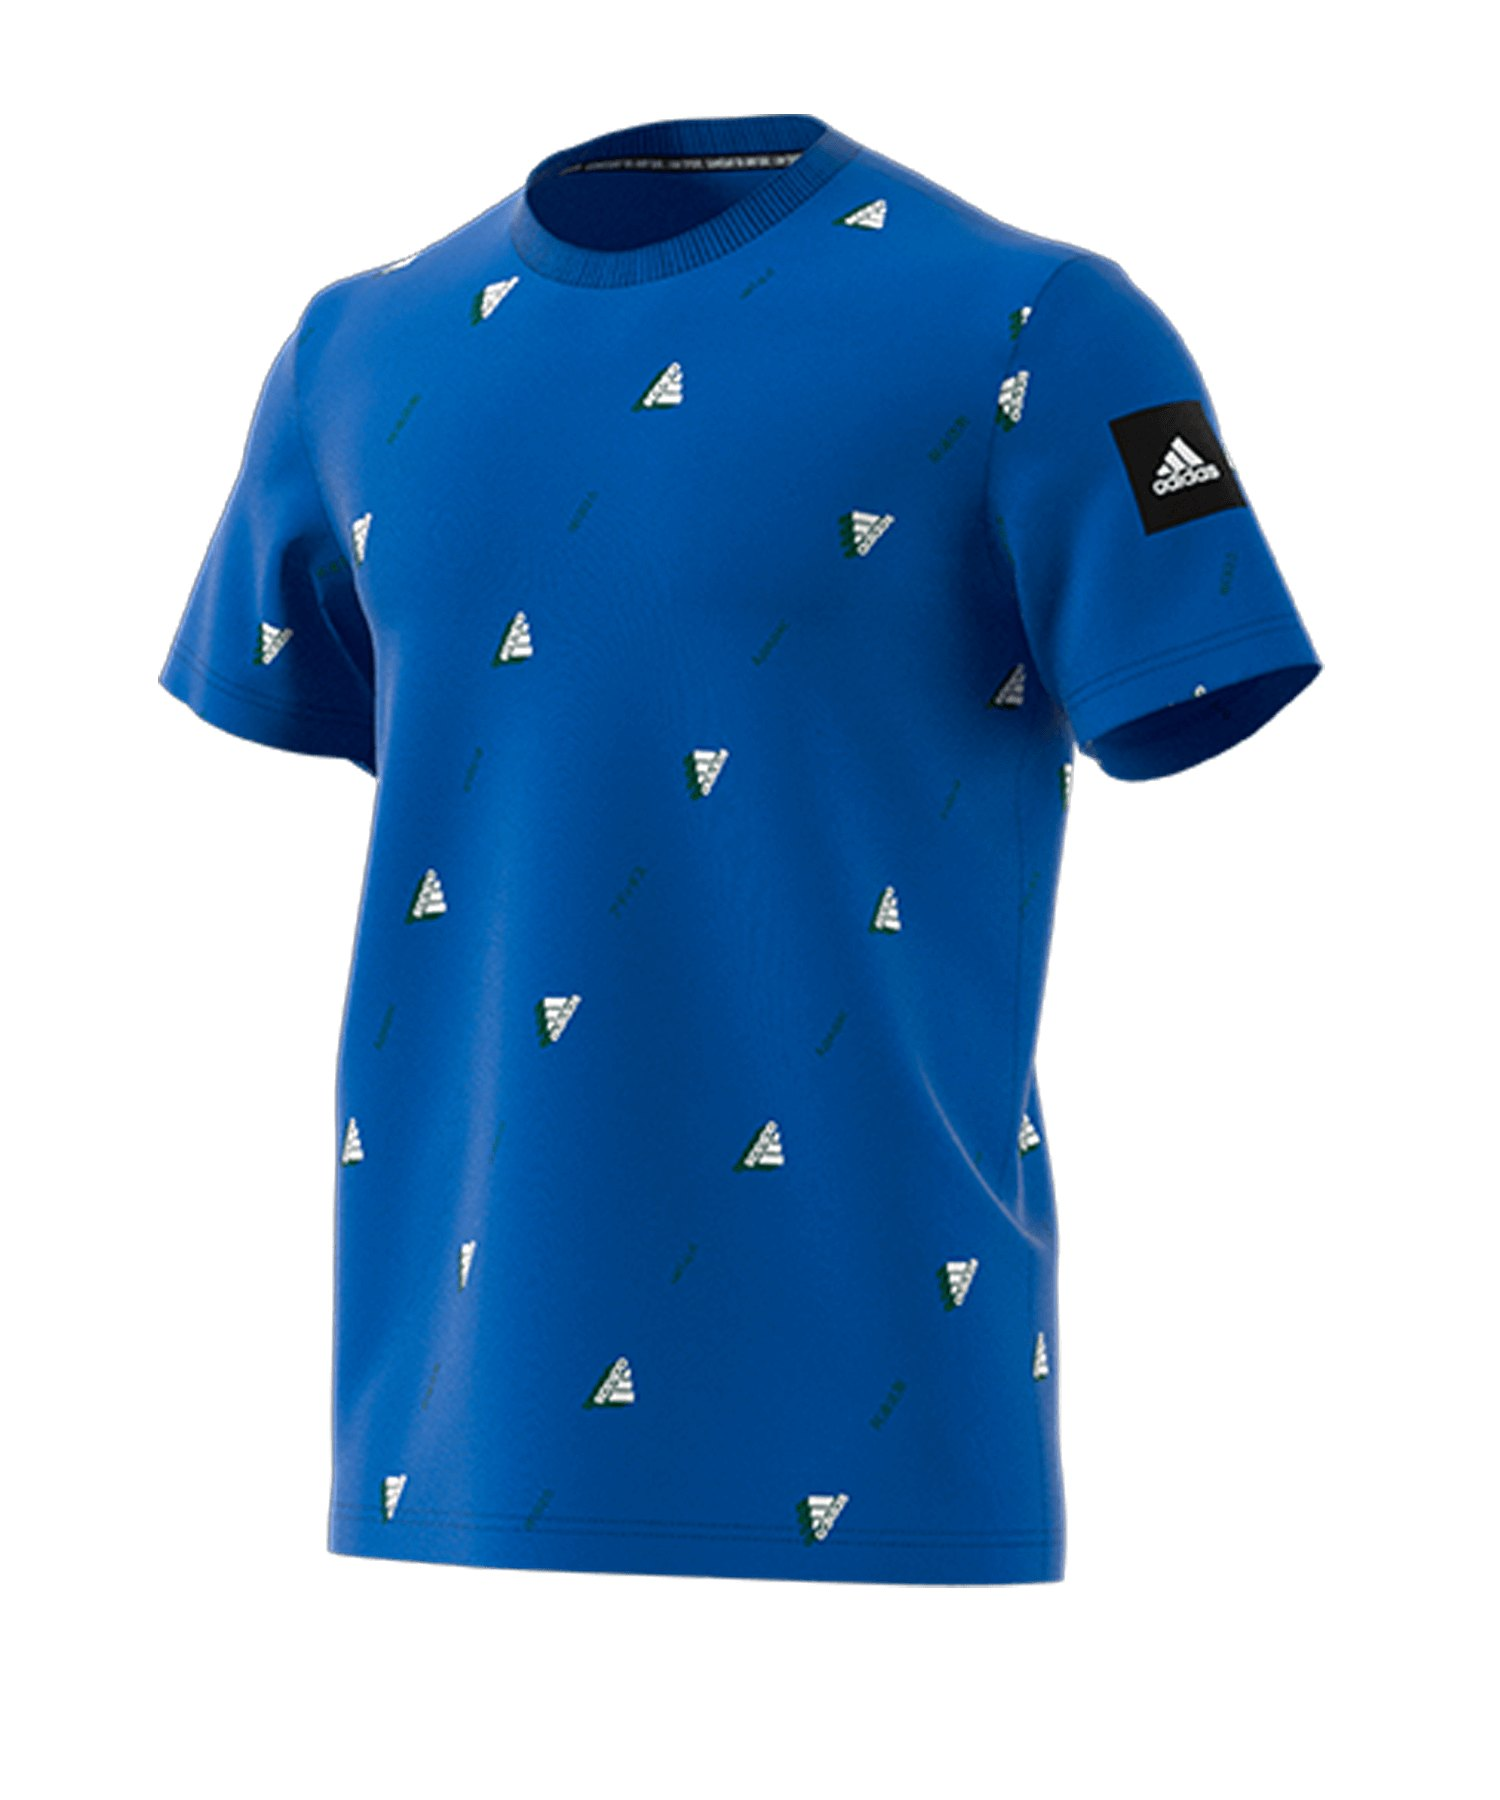 adidas Crew GFX T-shirt Blau Weiss - blau